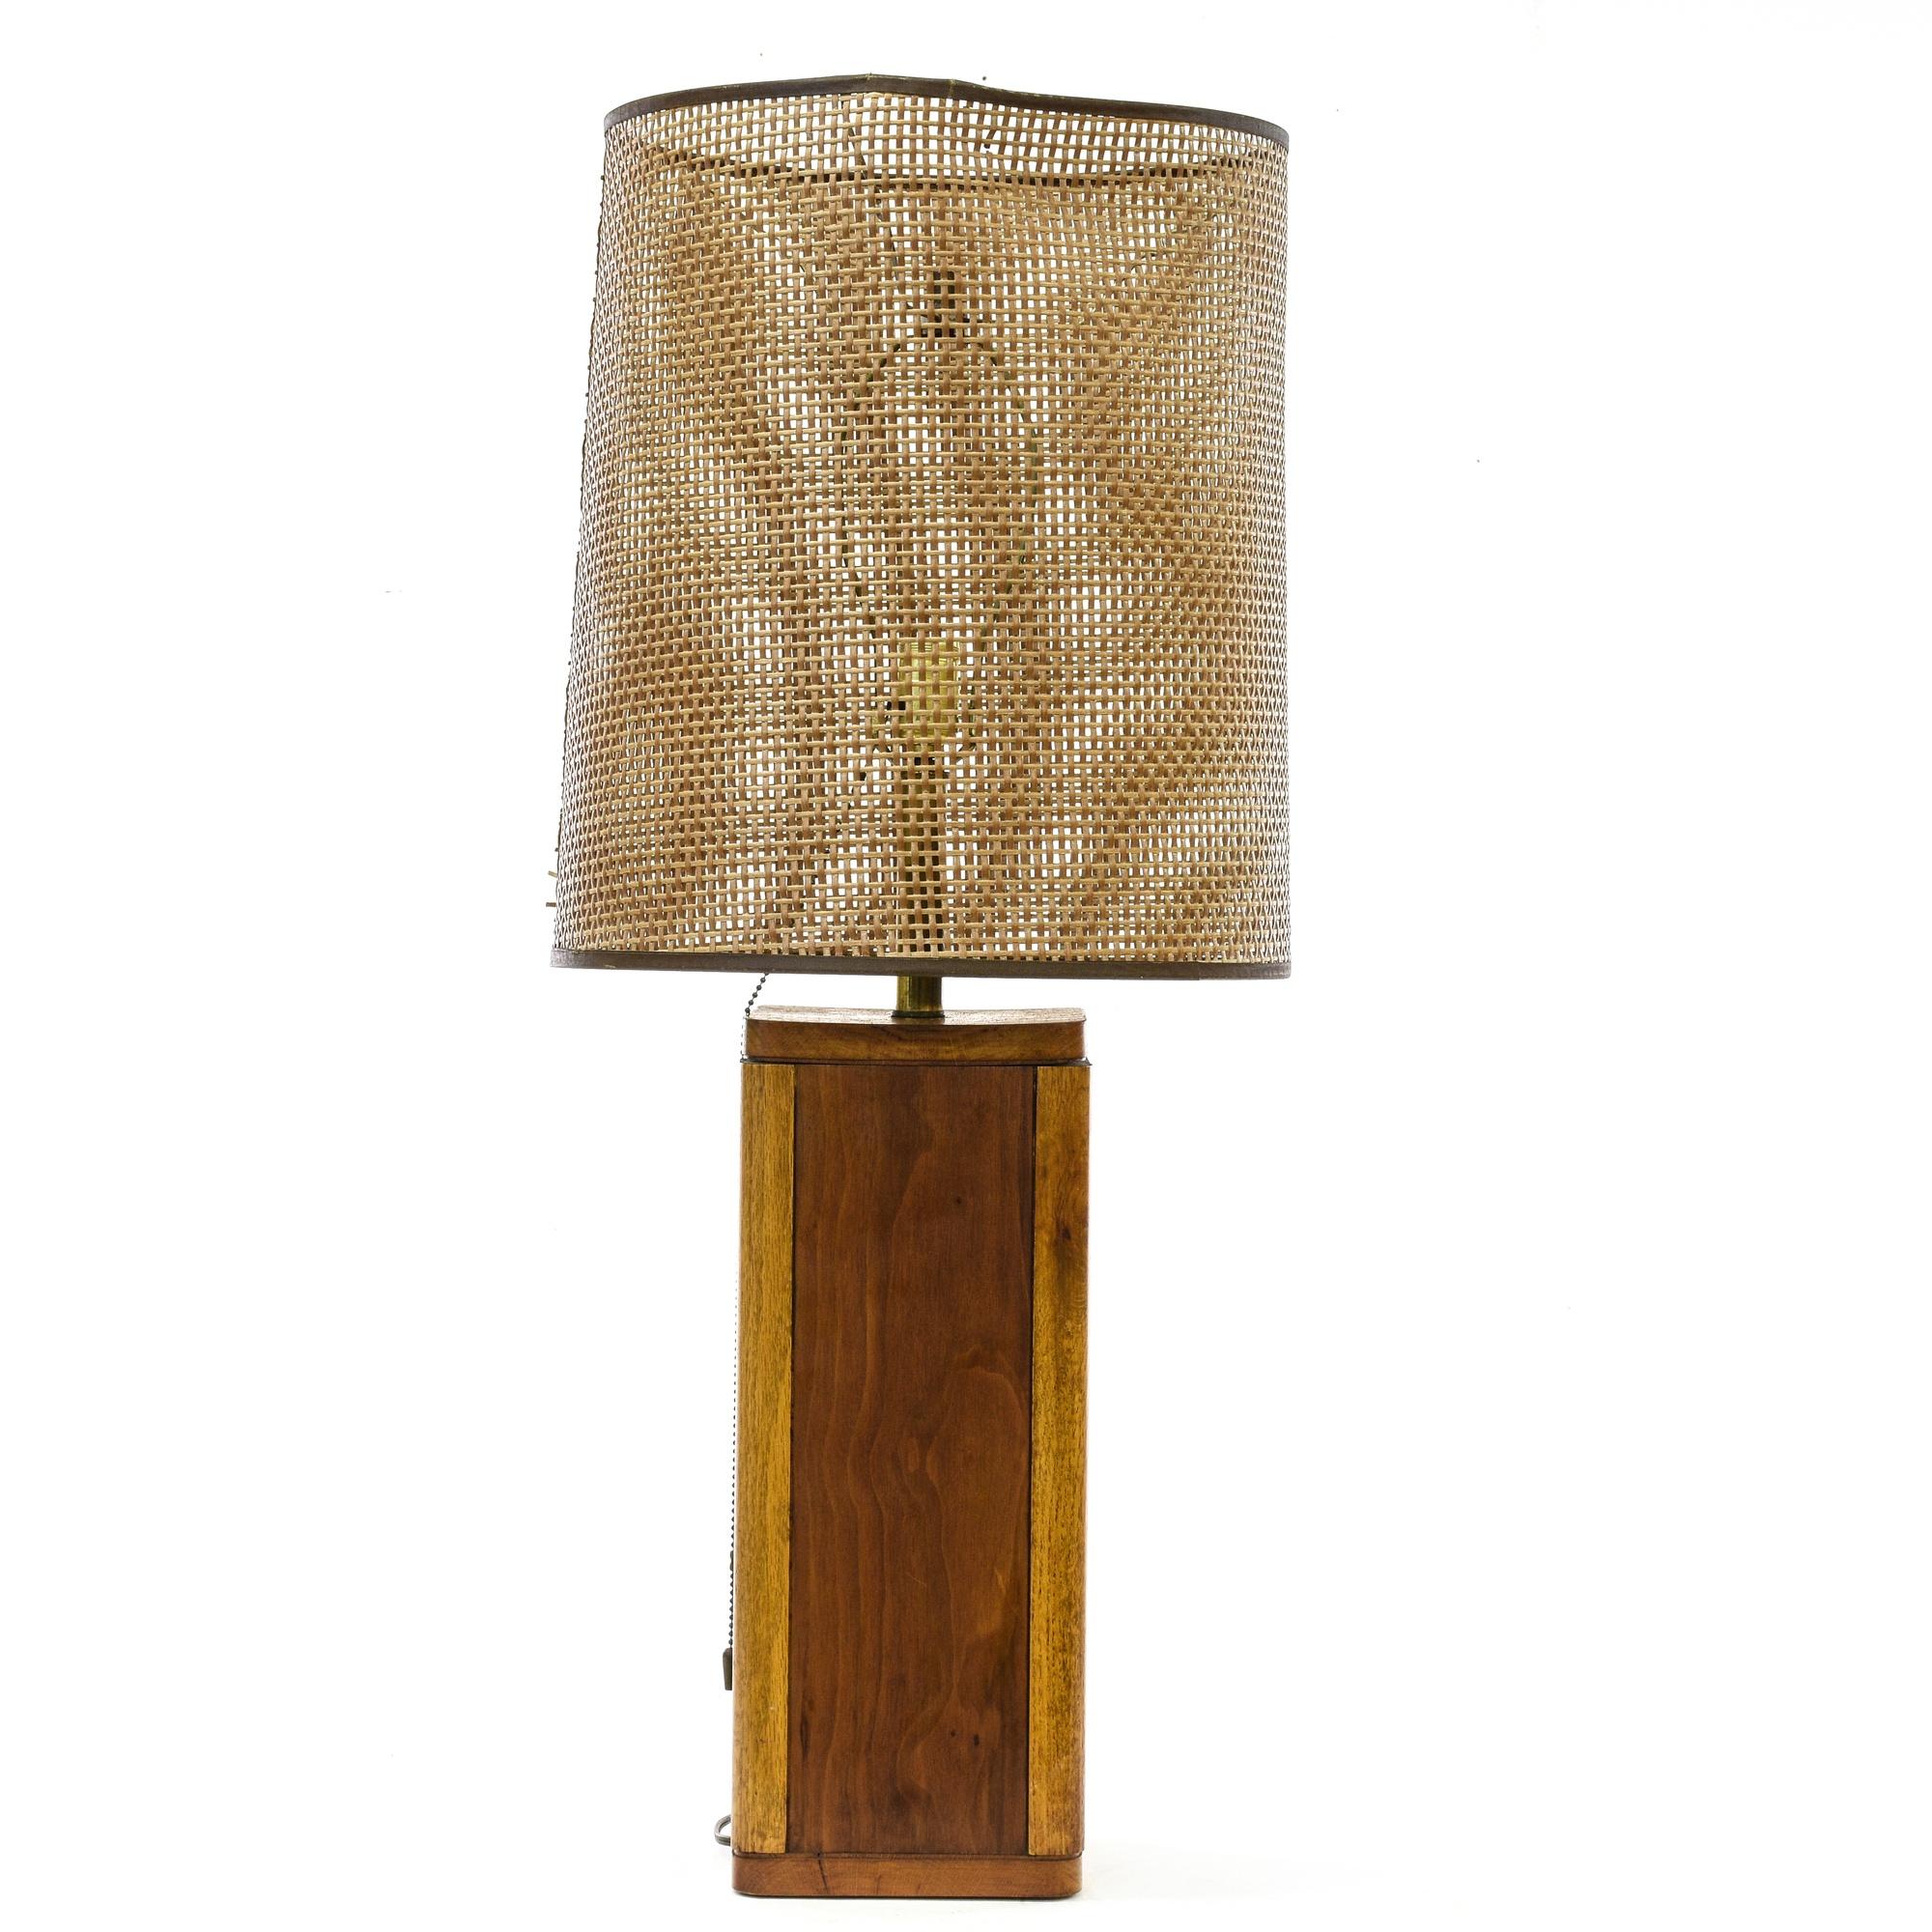 mid century wood woven shade table lamp loveseat vintage furniture san diego los angeles. Black Bedroom Furniture Sets. Home Design Ideas